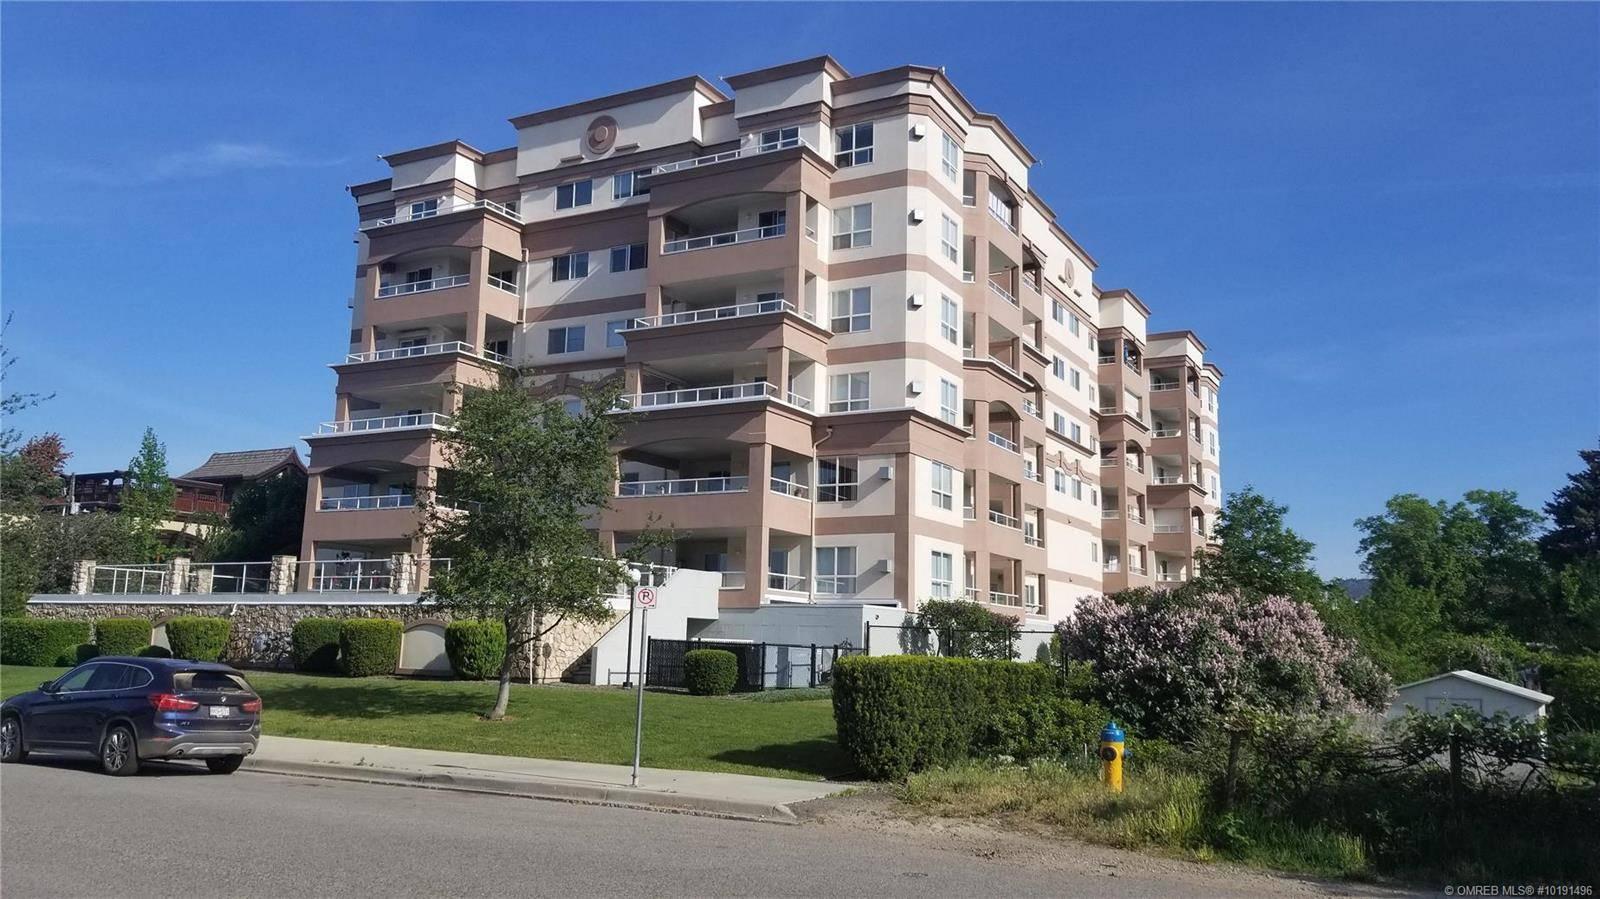 Condo for sale at 1895 Ambrosi Rd Unit 502 Kelowna British Columbia - MLS: 10191496